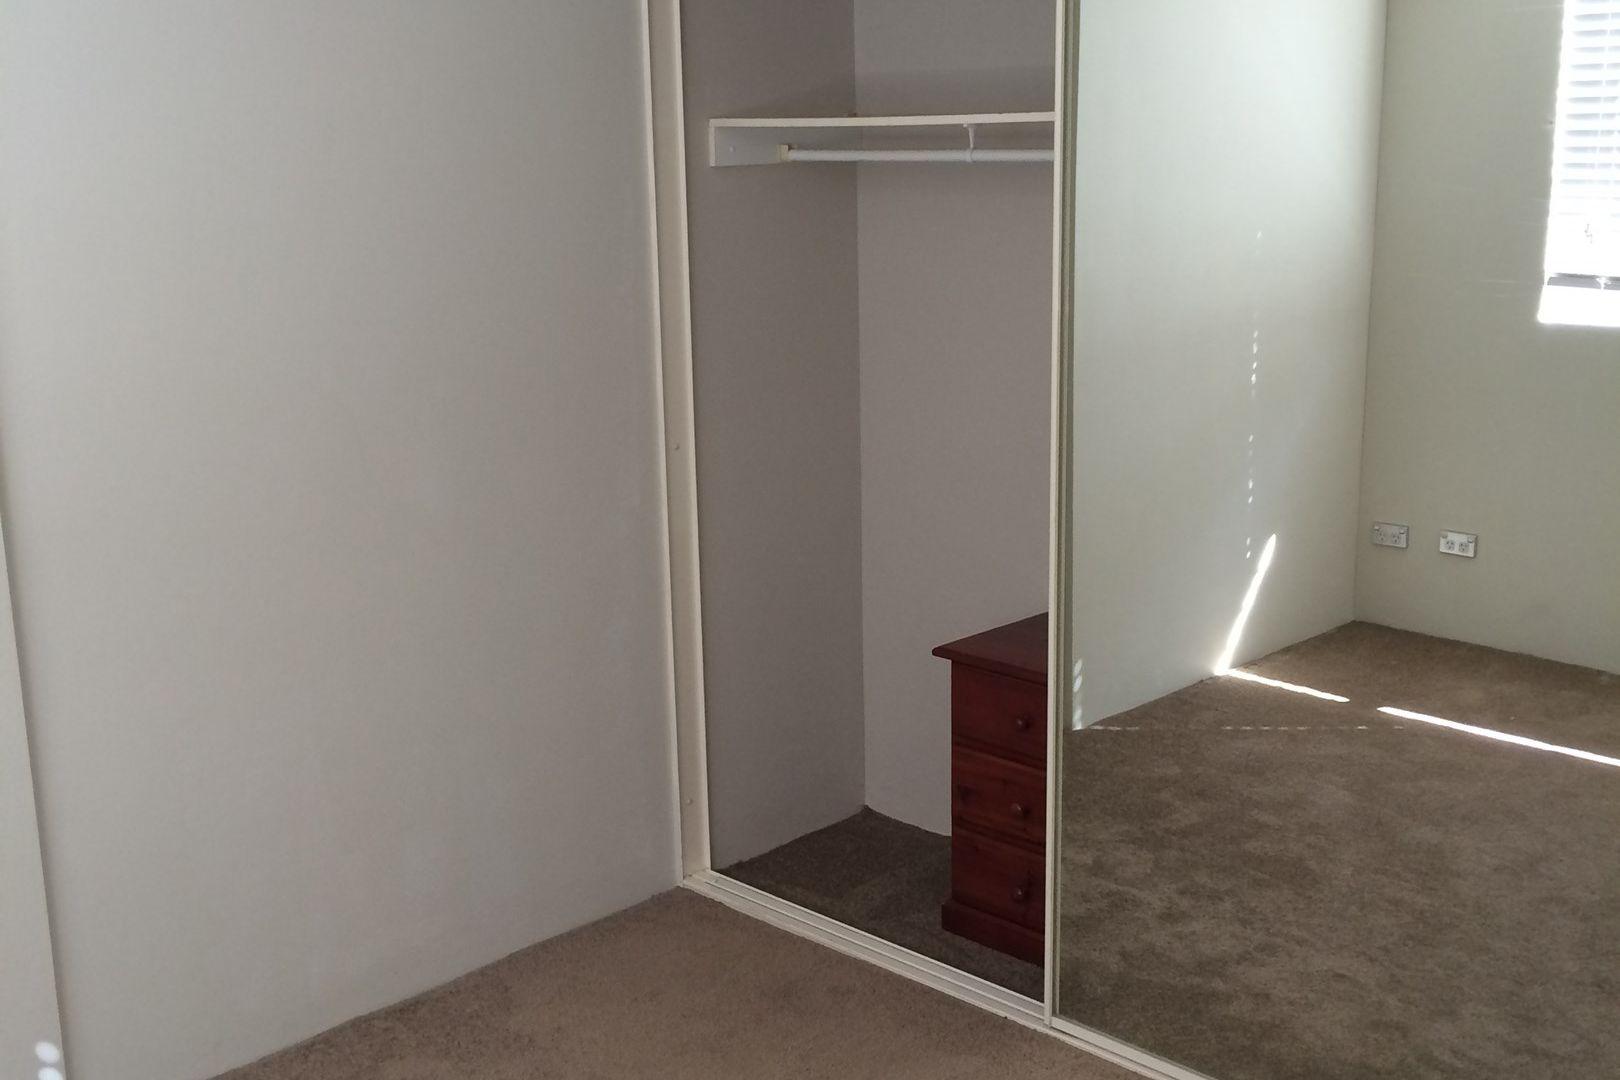 20/18-20 Sorrell Street, Parramatta NSW 2150, Image 2